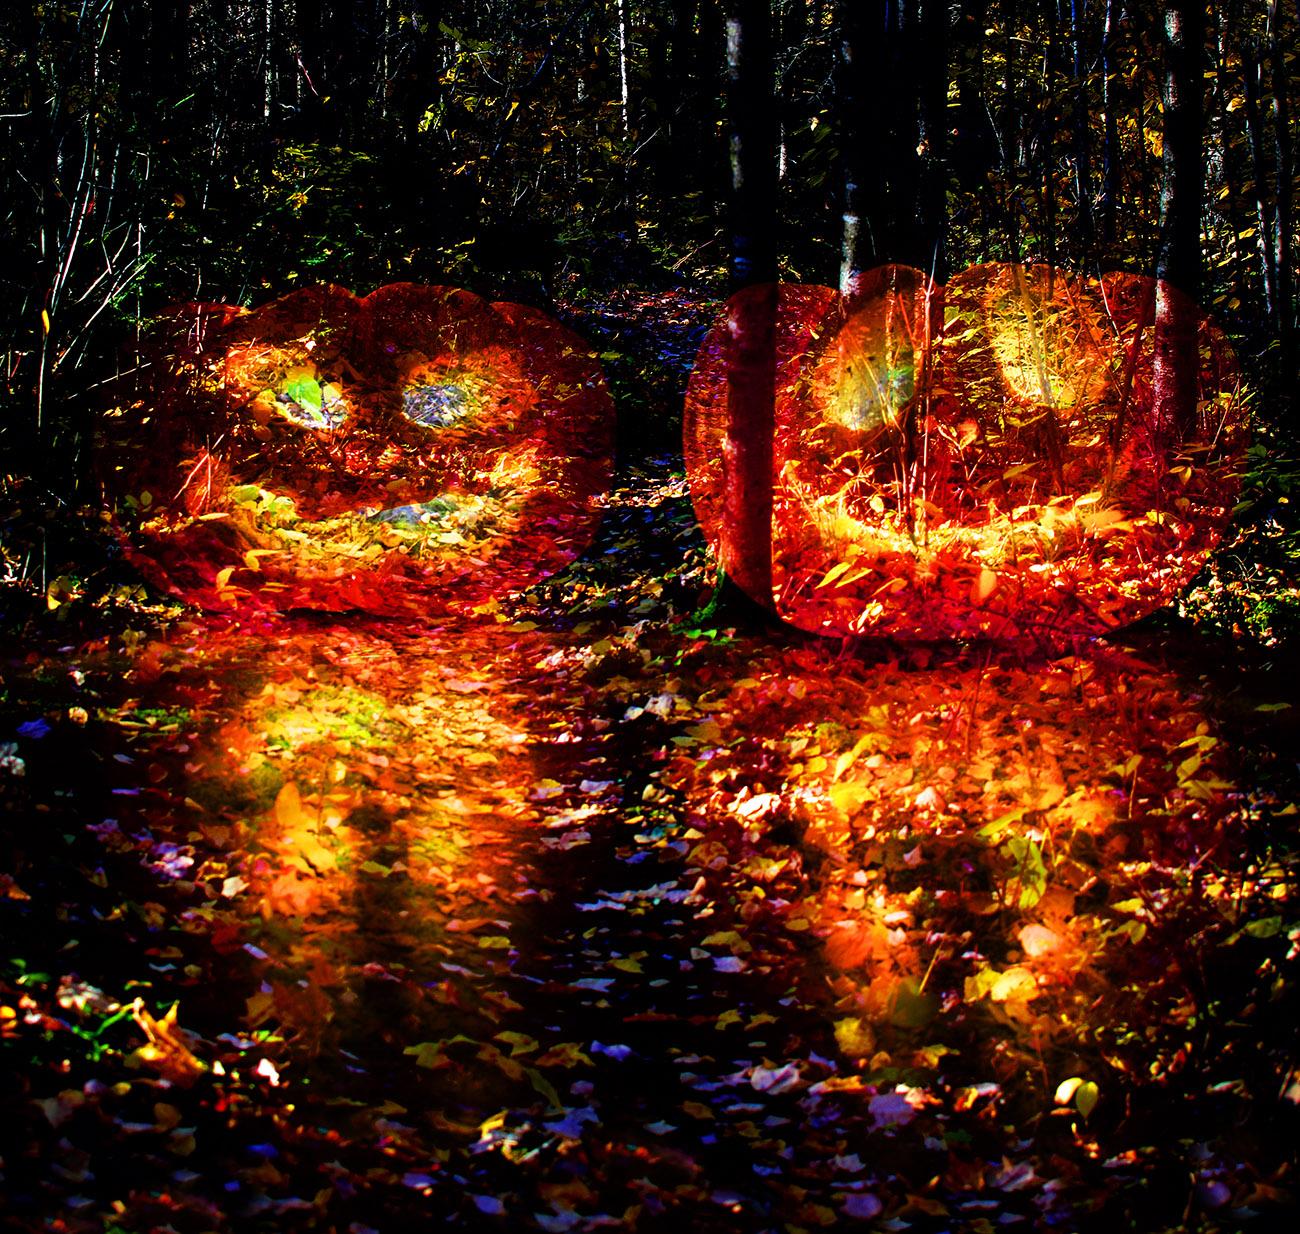 Halloween Scary Wood 3 - RF Stock Image